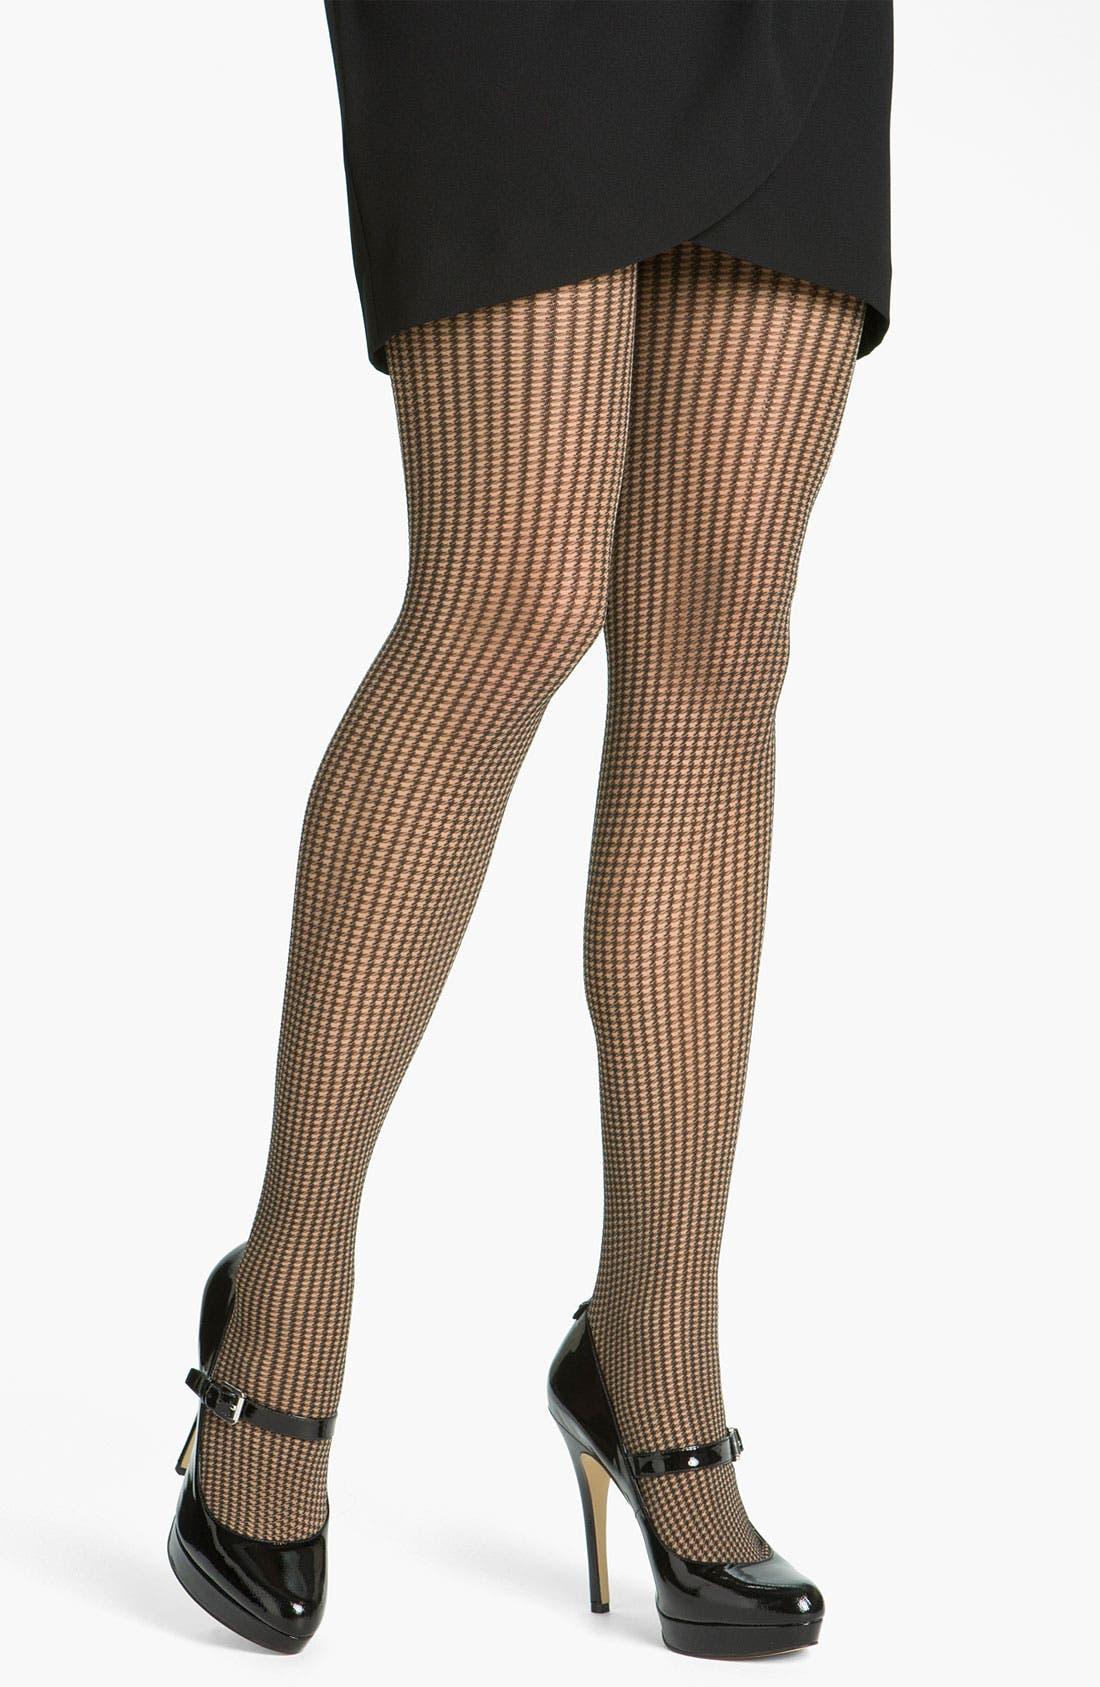 Alternate Image 1 Selected - Wolford 'Elisa' Stockings